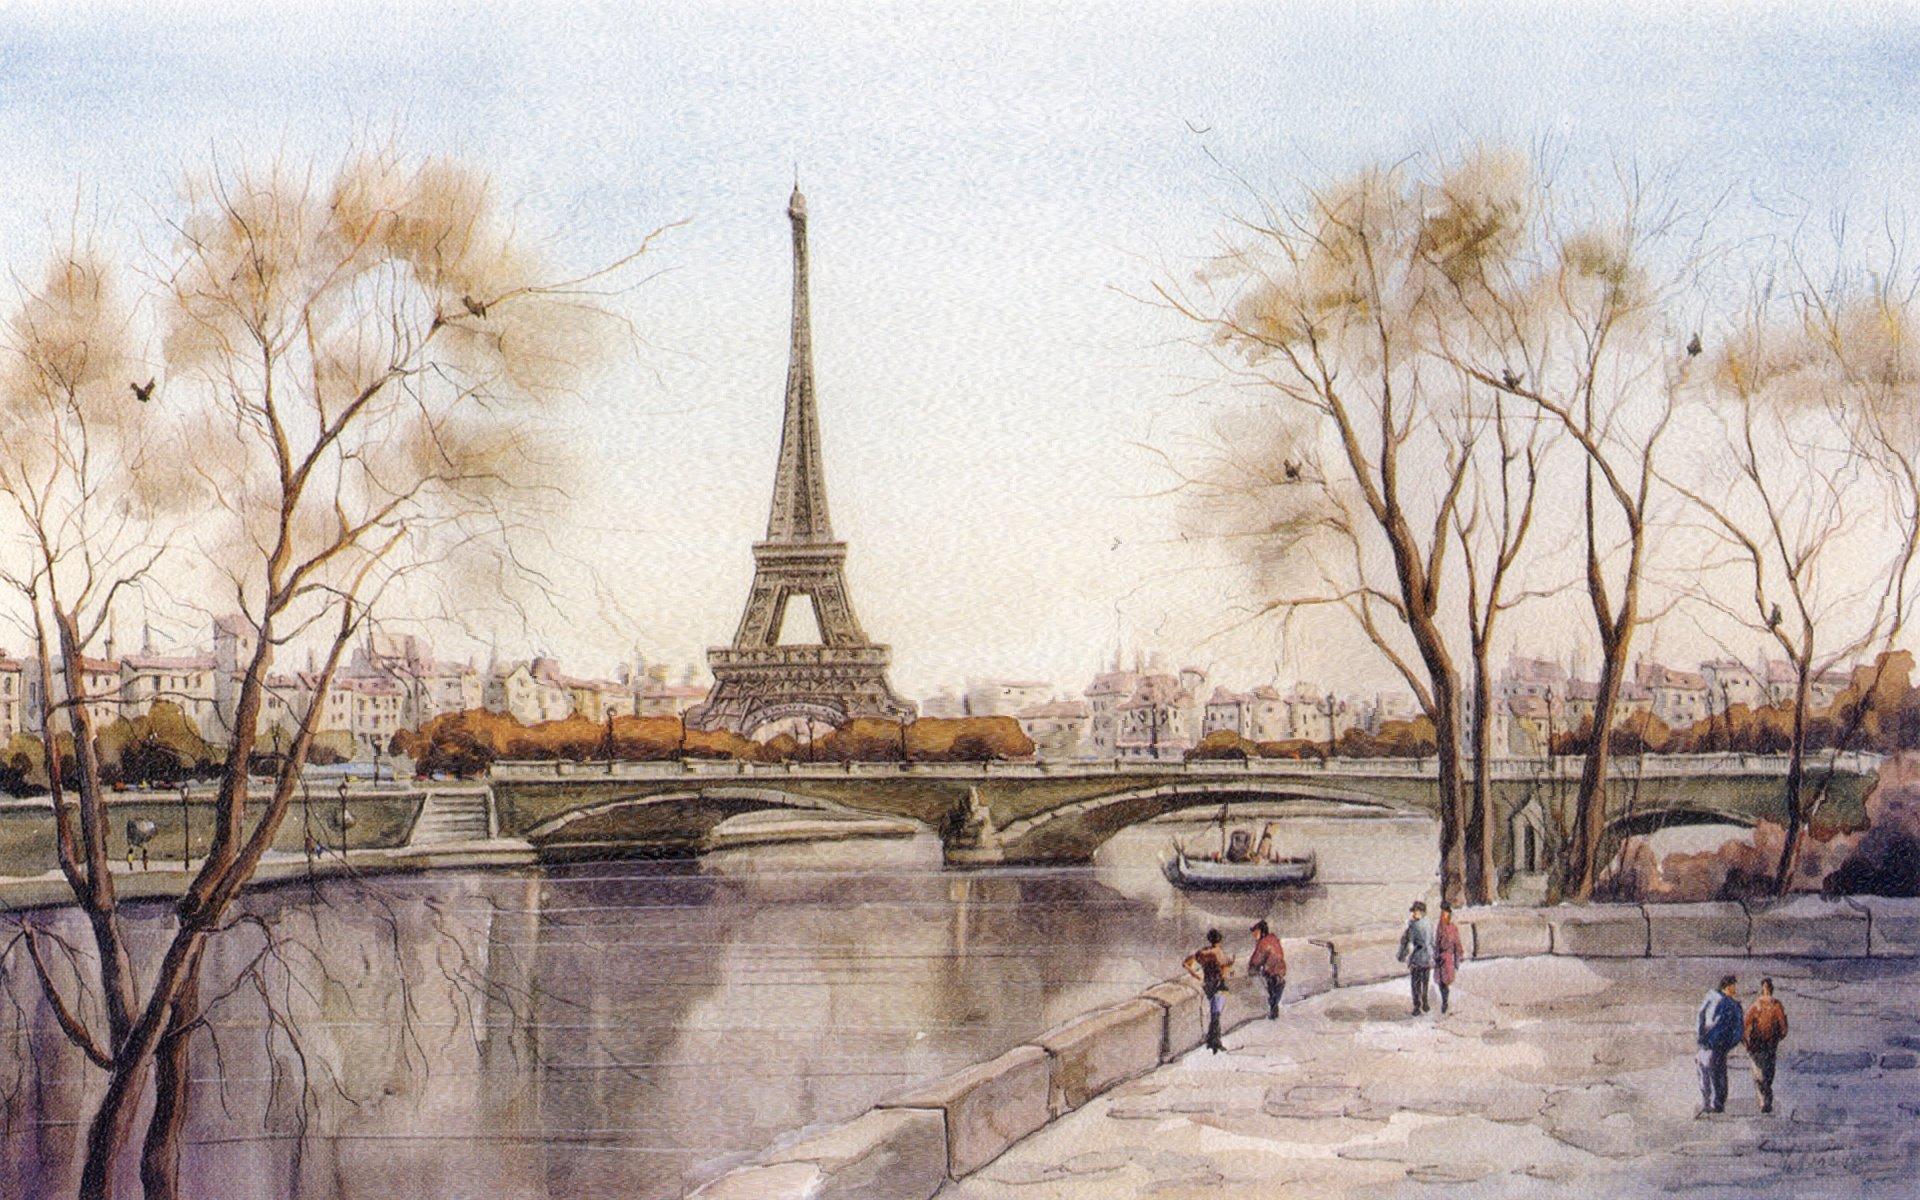 Обои Эйфелева башня, рисунок. Города foto 8